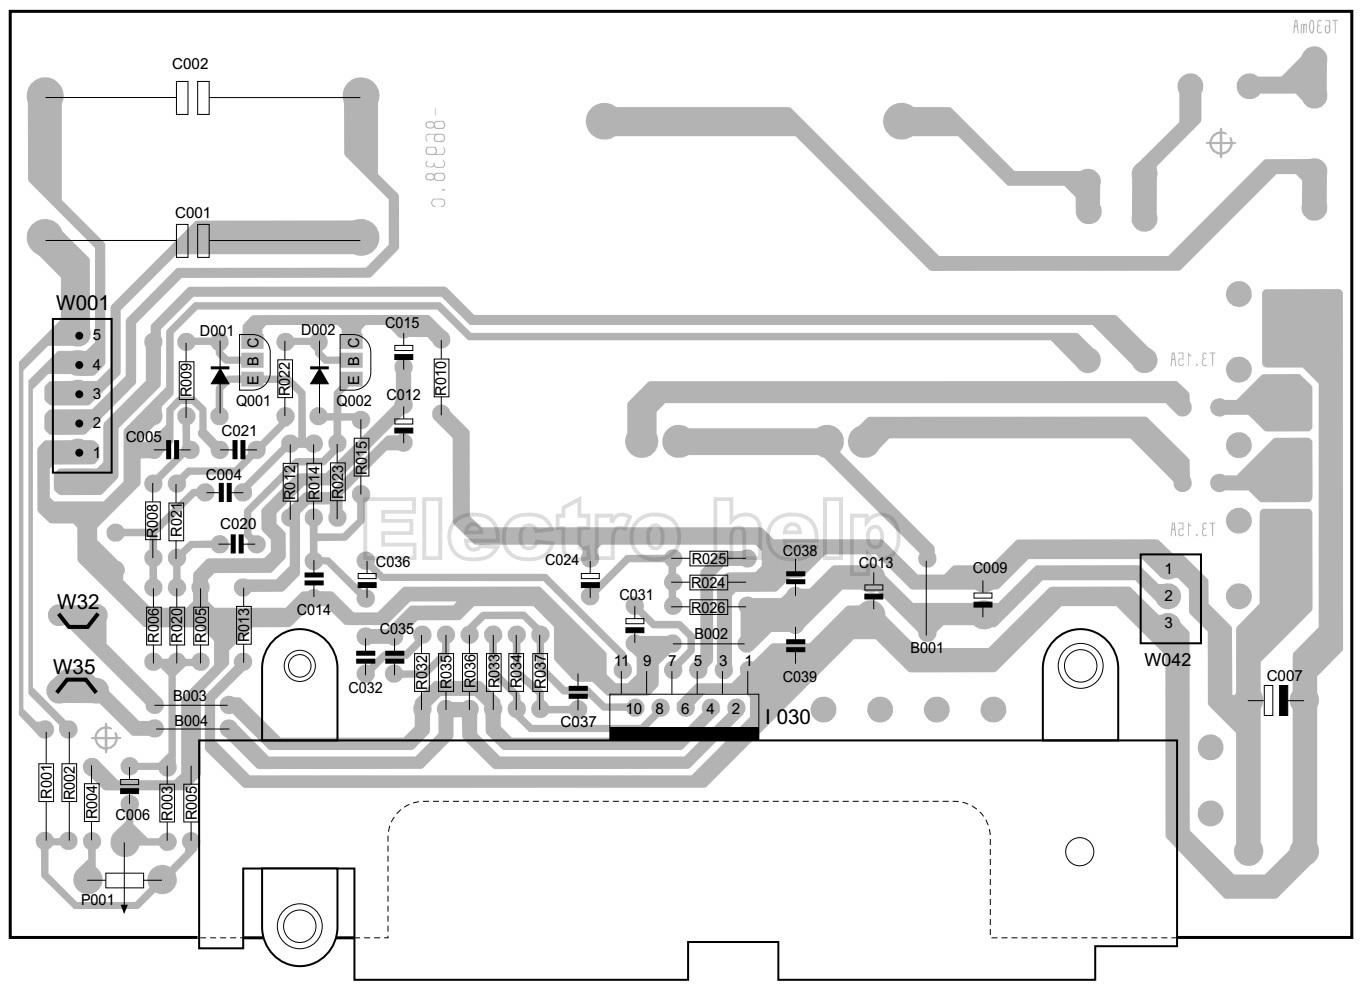 sub woofer circuit diagram 35 watts tda 7265 schematic diagrams